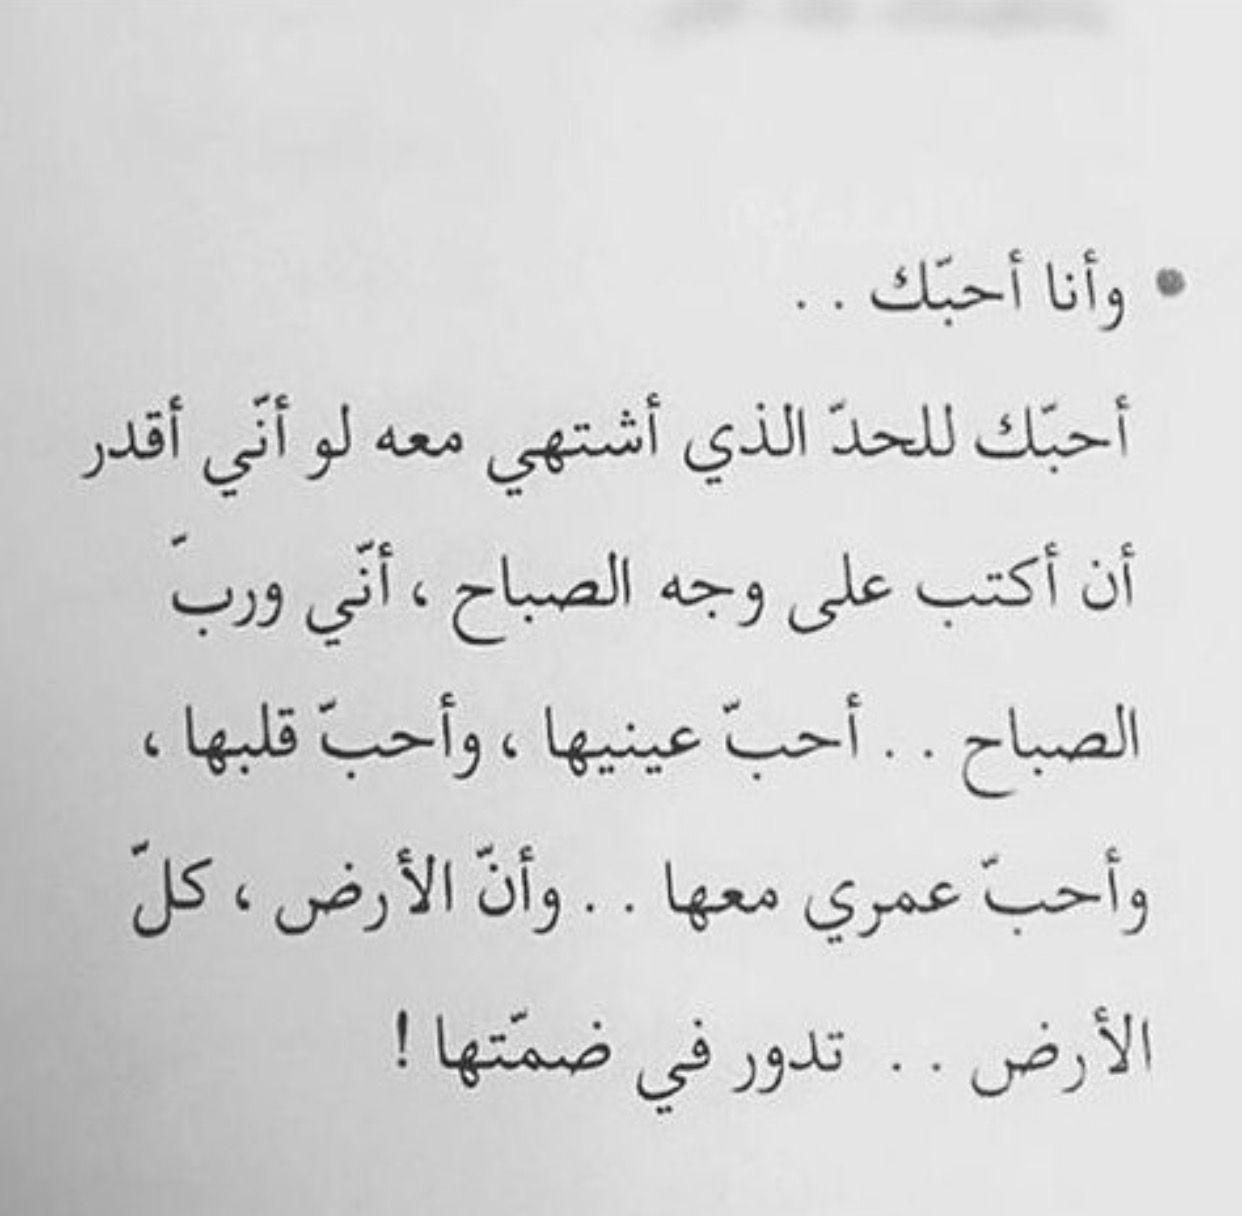 و انا احبك Quotes Arabic Calligraphy Calligraphy